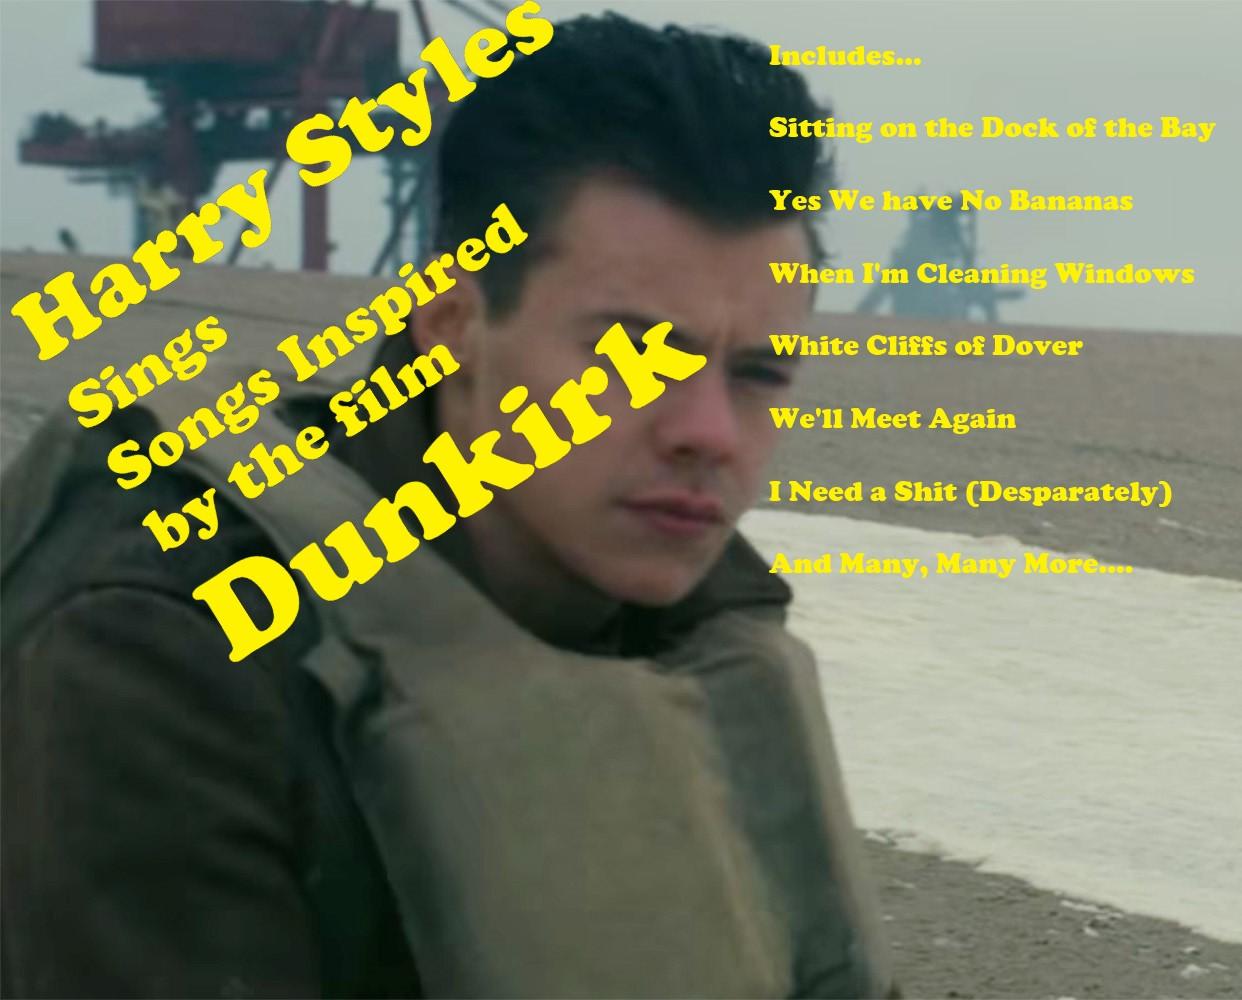 HARRY STYLES RELEASES DUNKIRK ALBUM